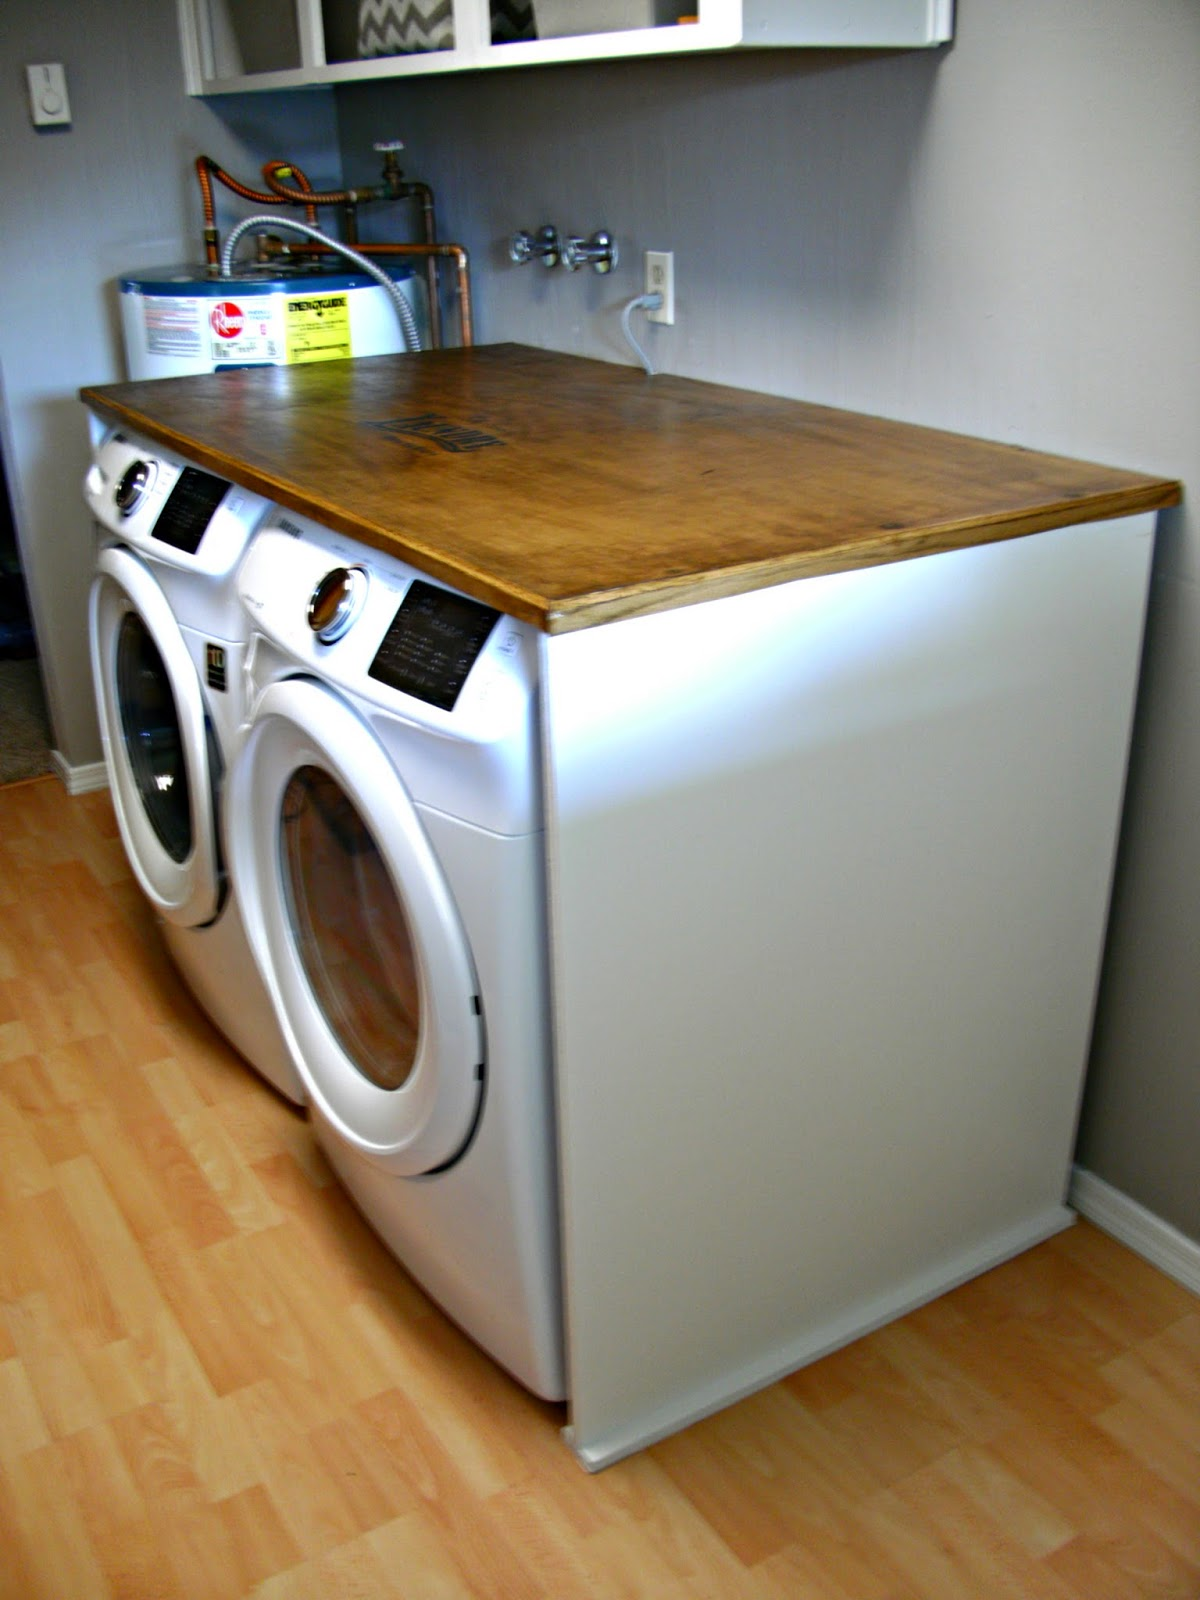 Laundry Room Redo Diy Laundry Folding Table Little